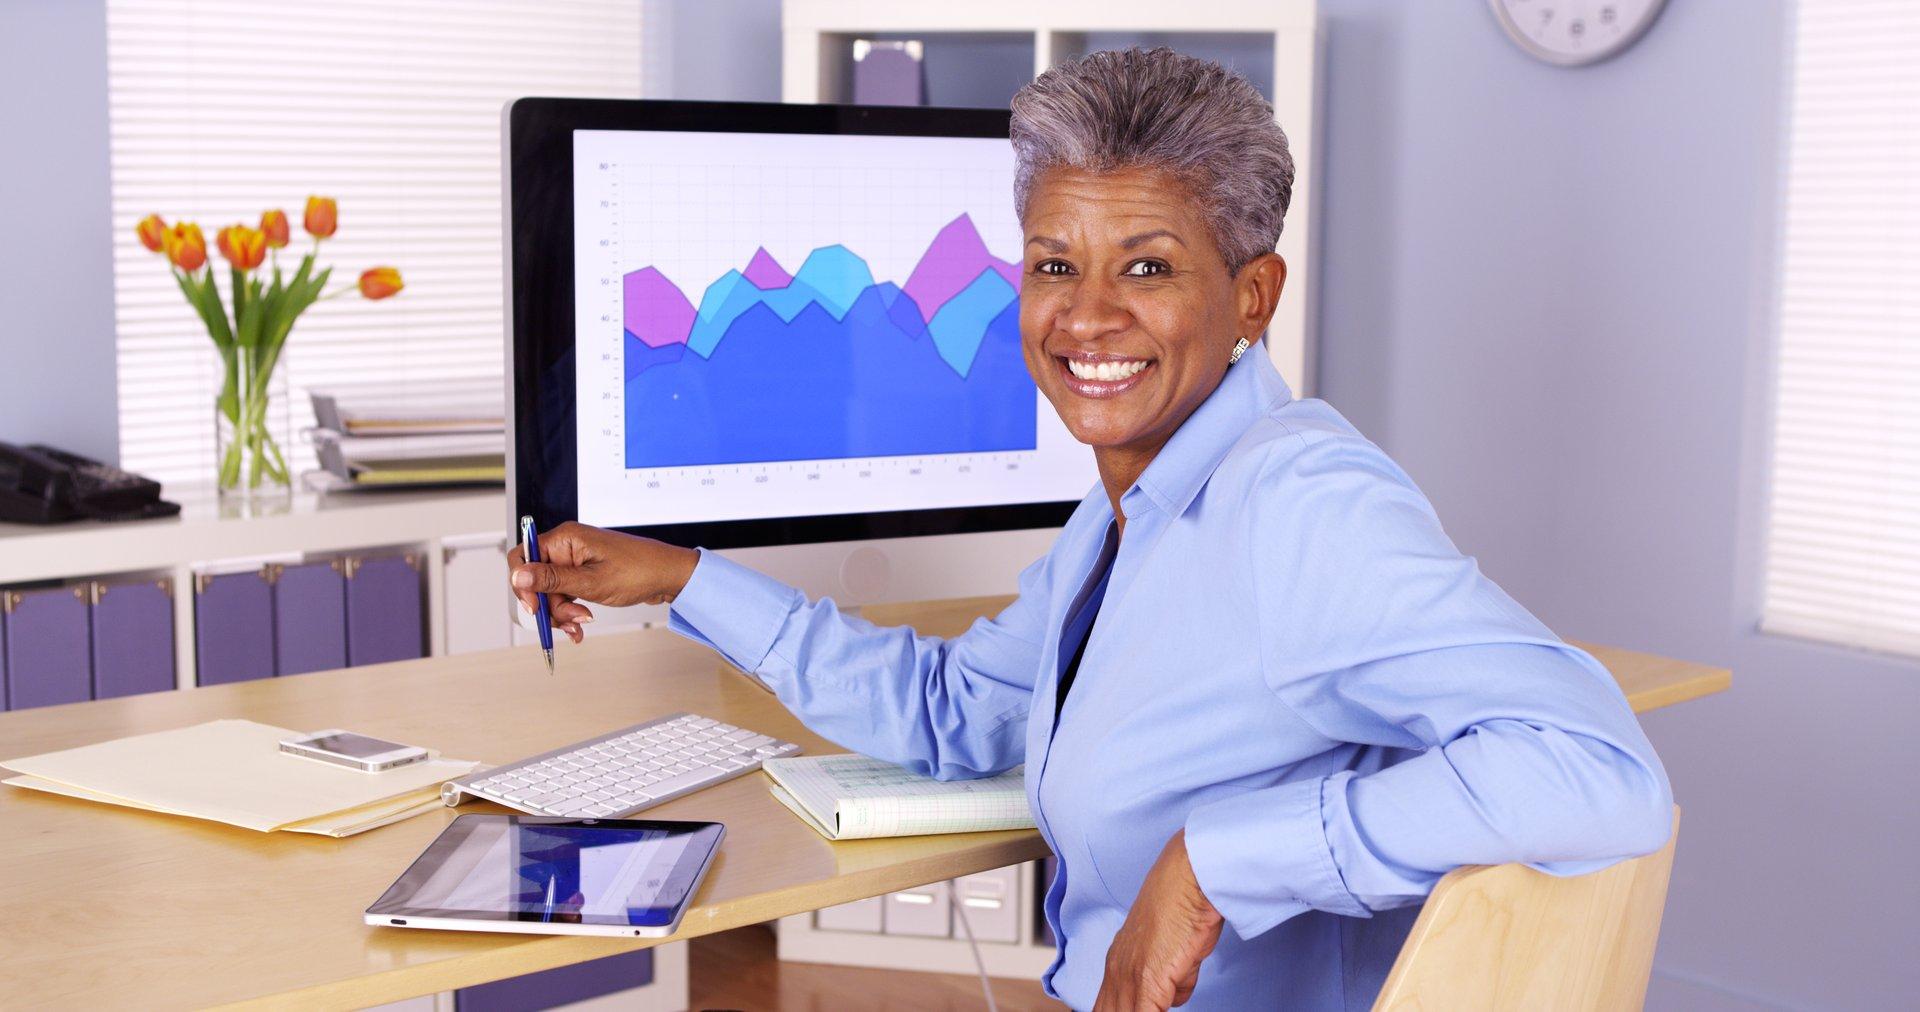 Senior woman working